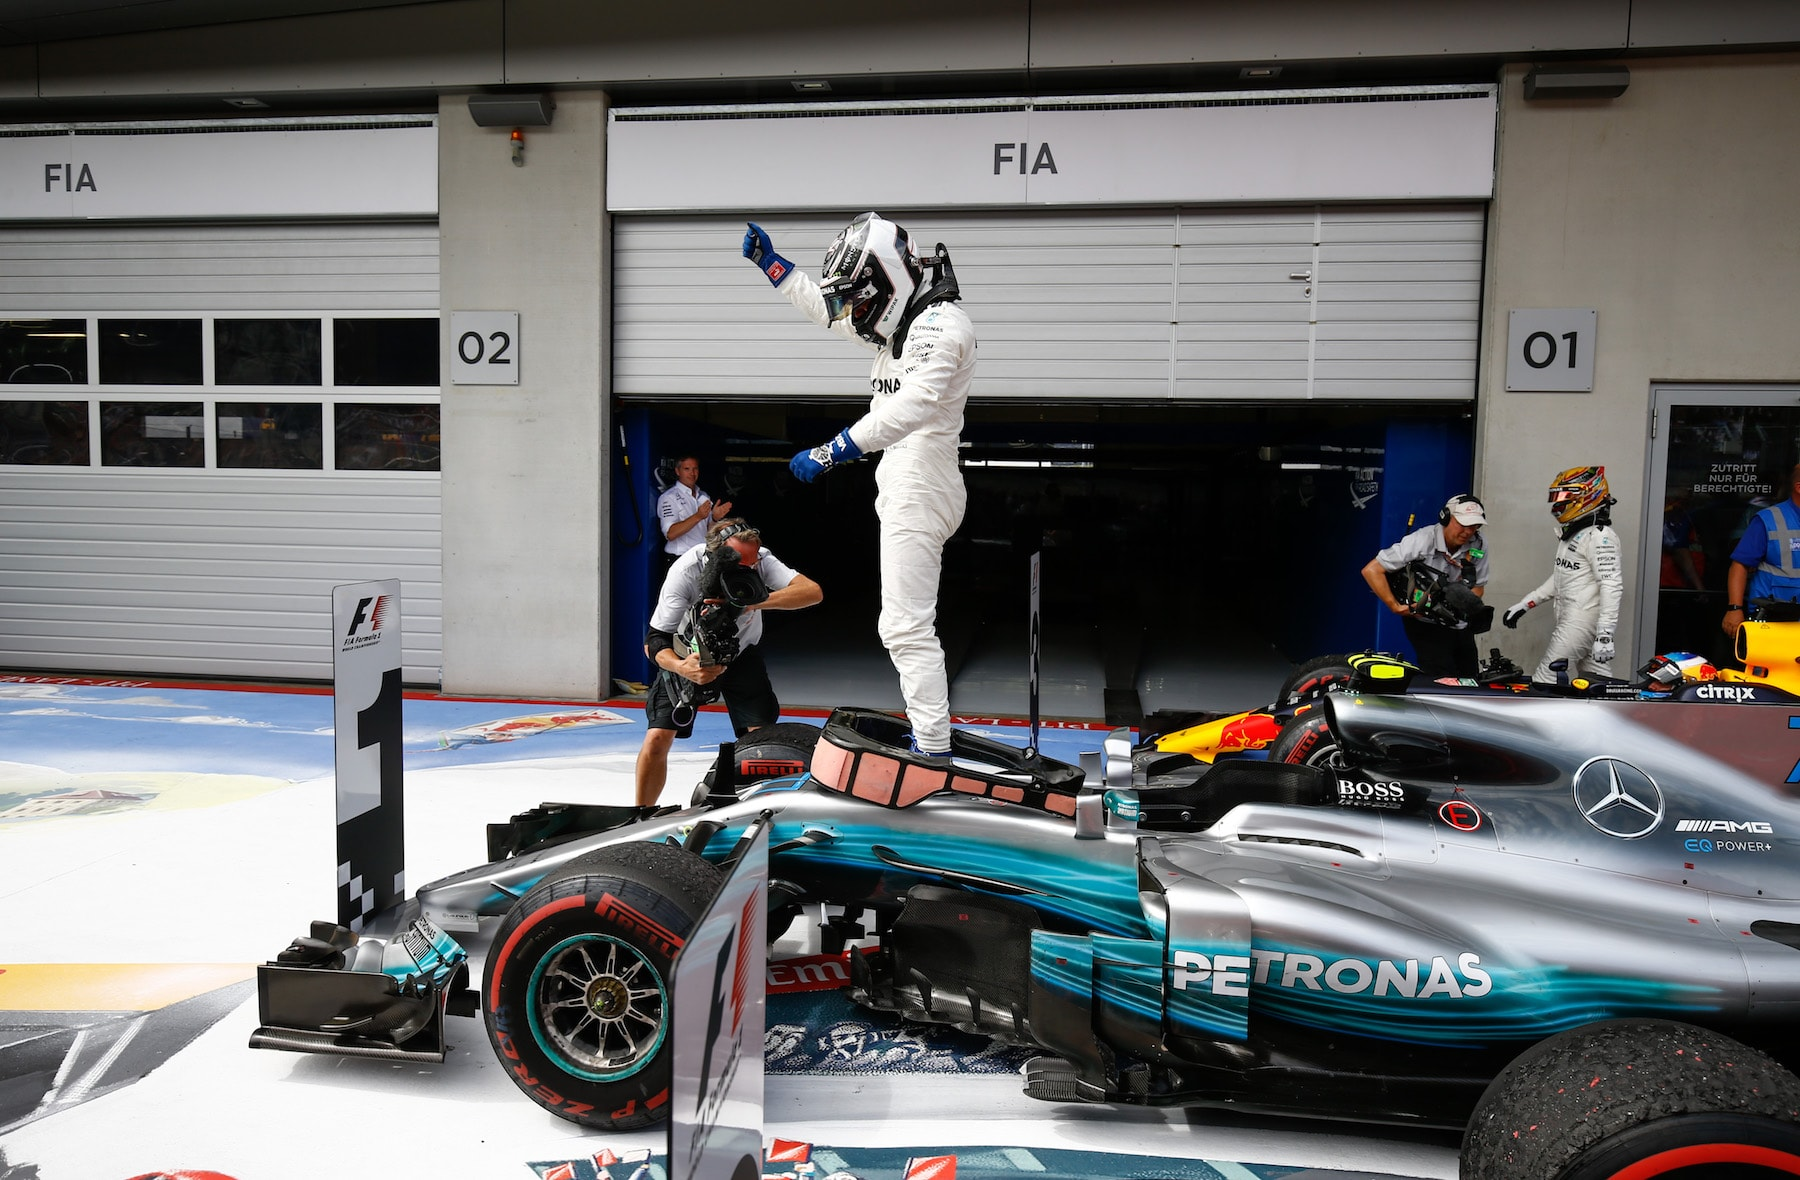 X 2017 Valtteri Bottas | Mercedes W08 | 2017 Austrian GP winner 5 copy.jpg